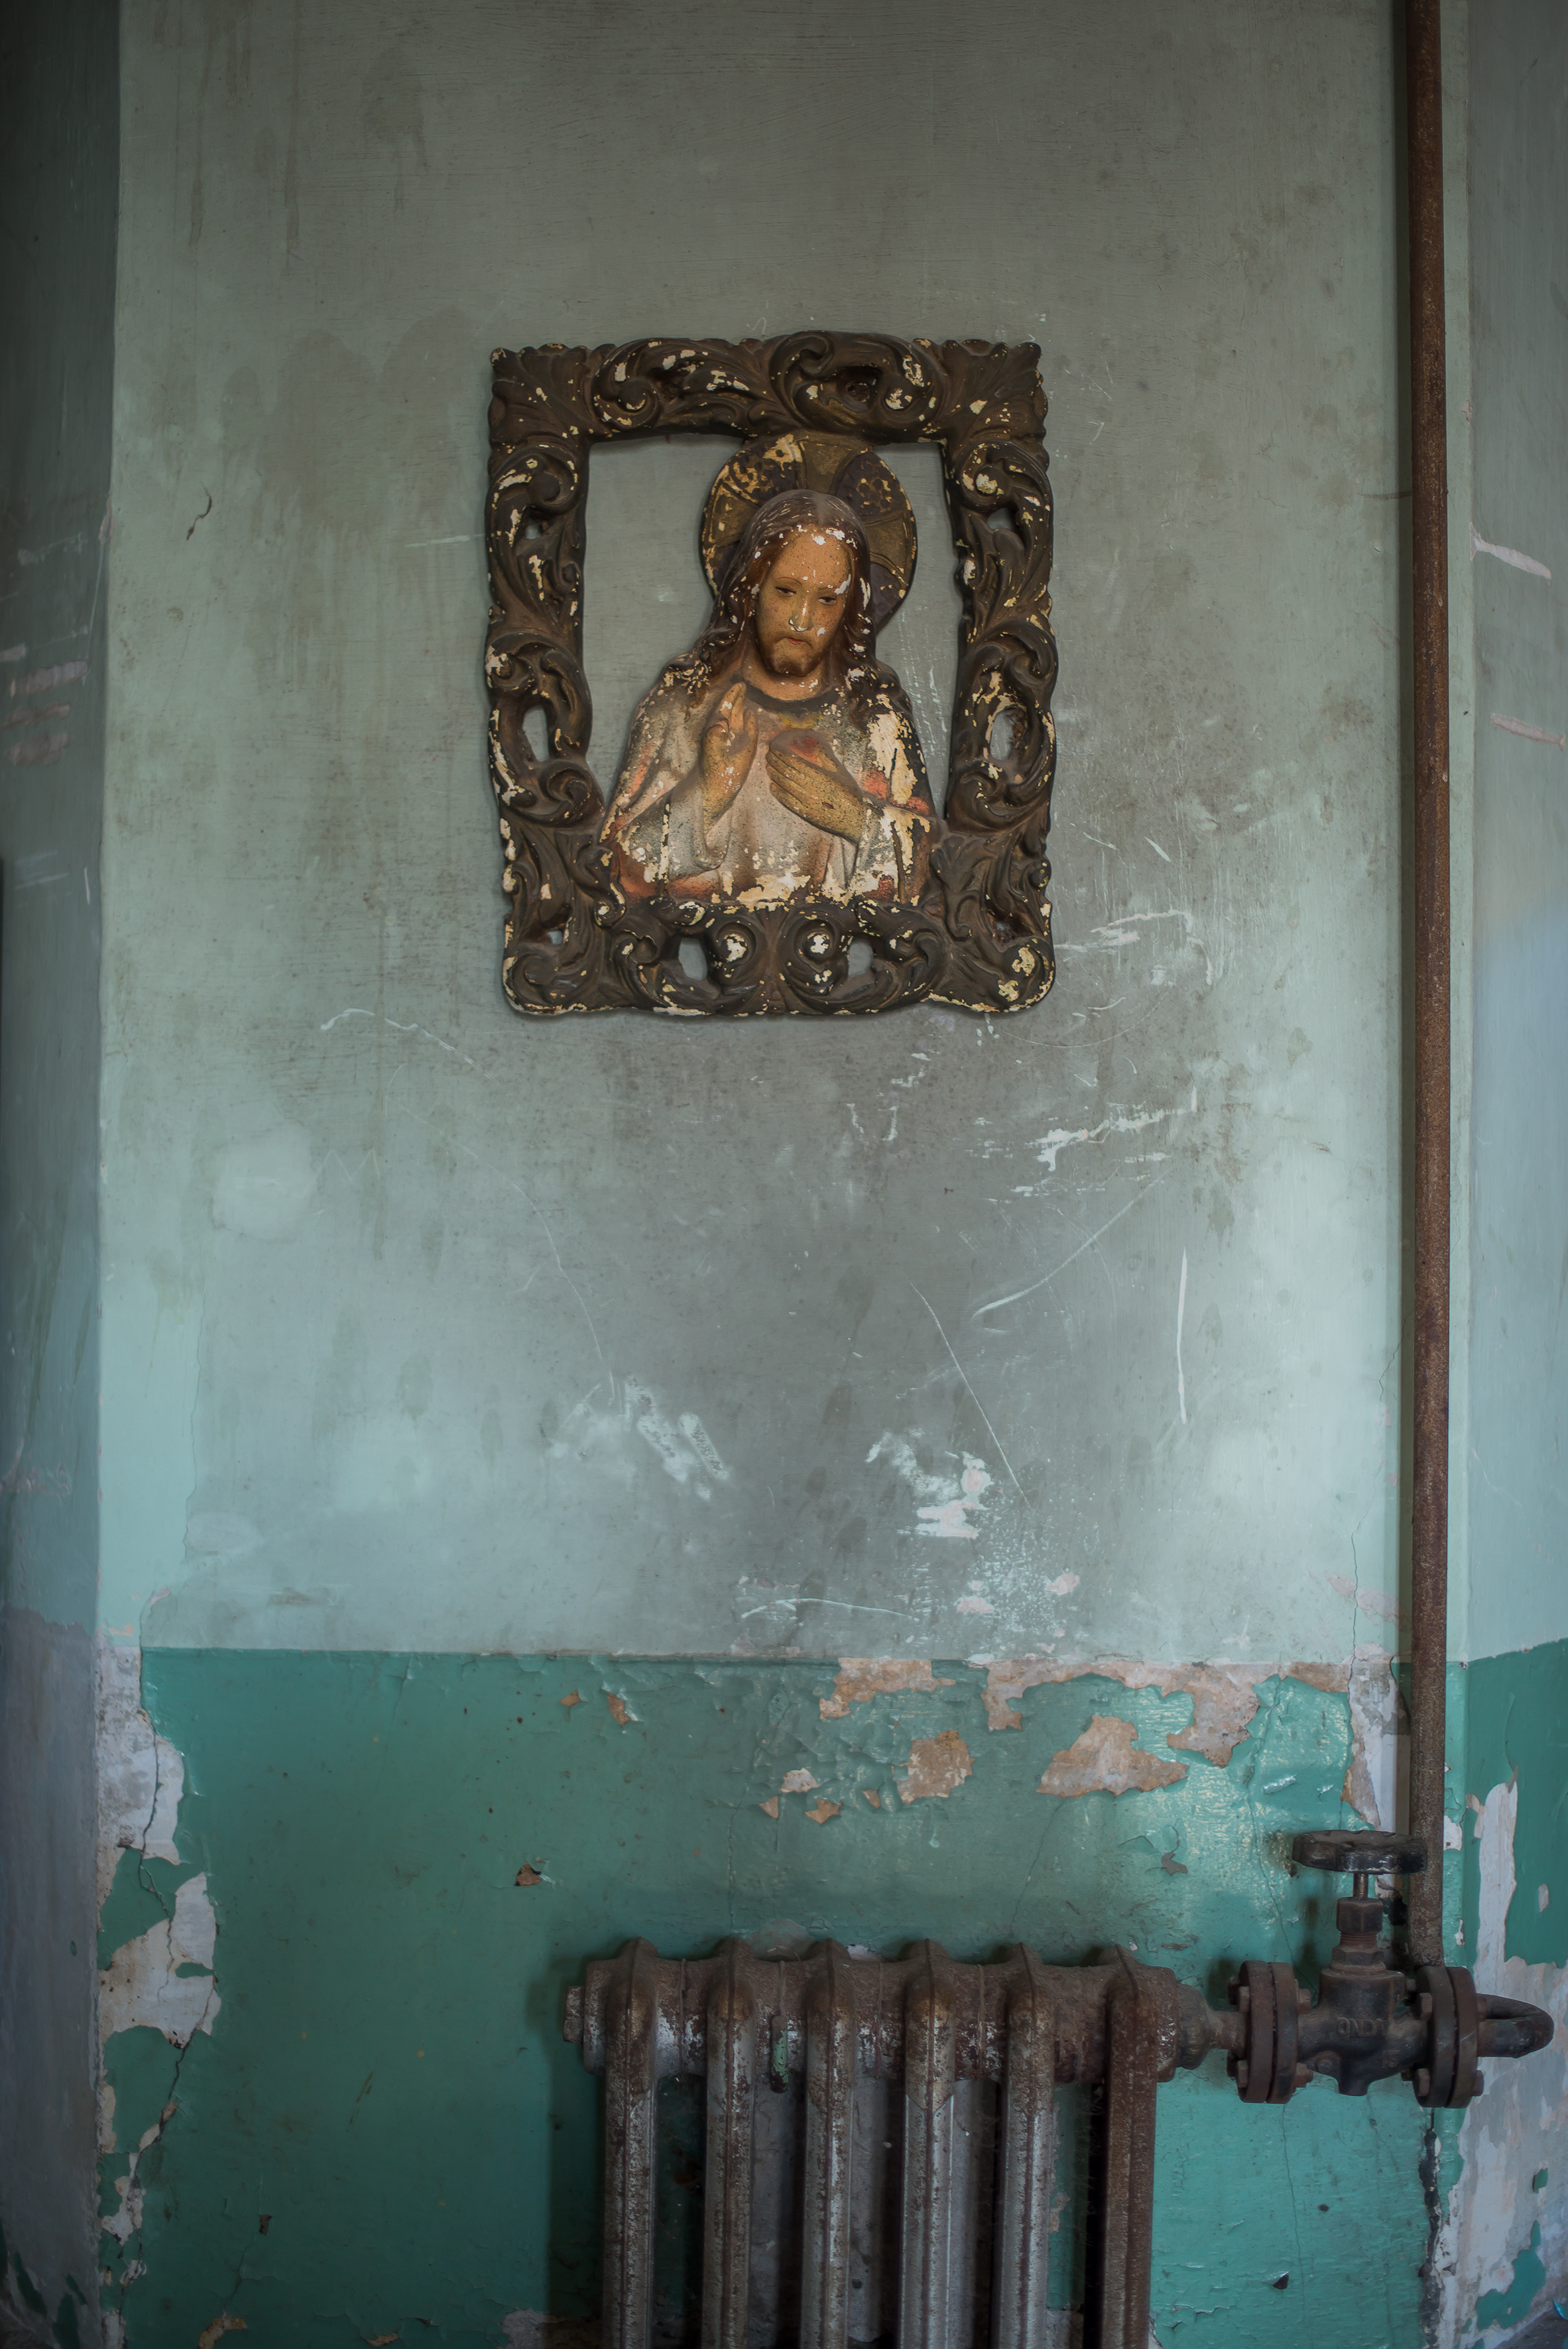 Untitled 4, Cal Rosal, 2017